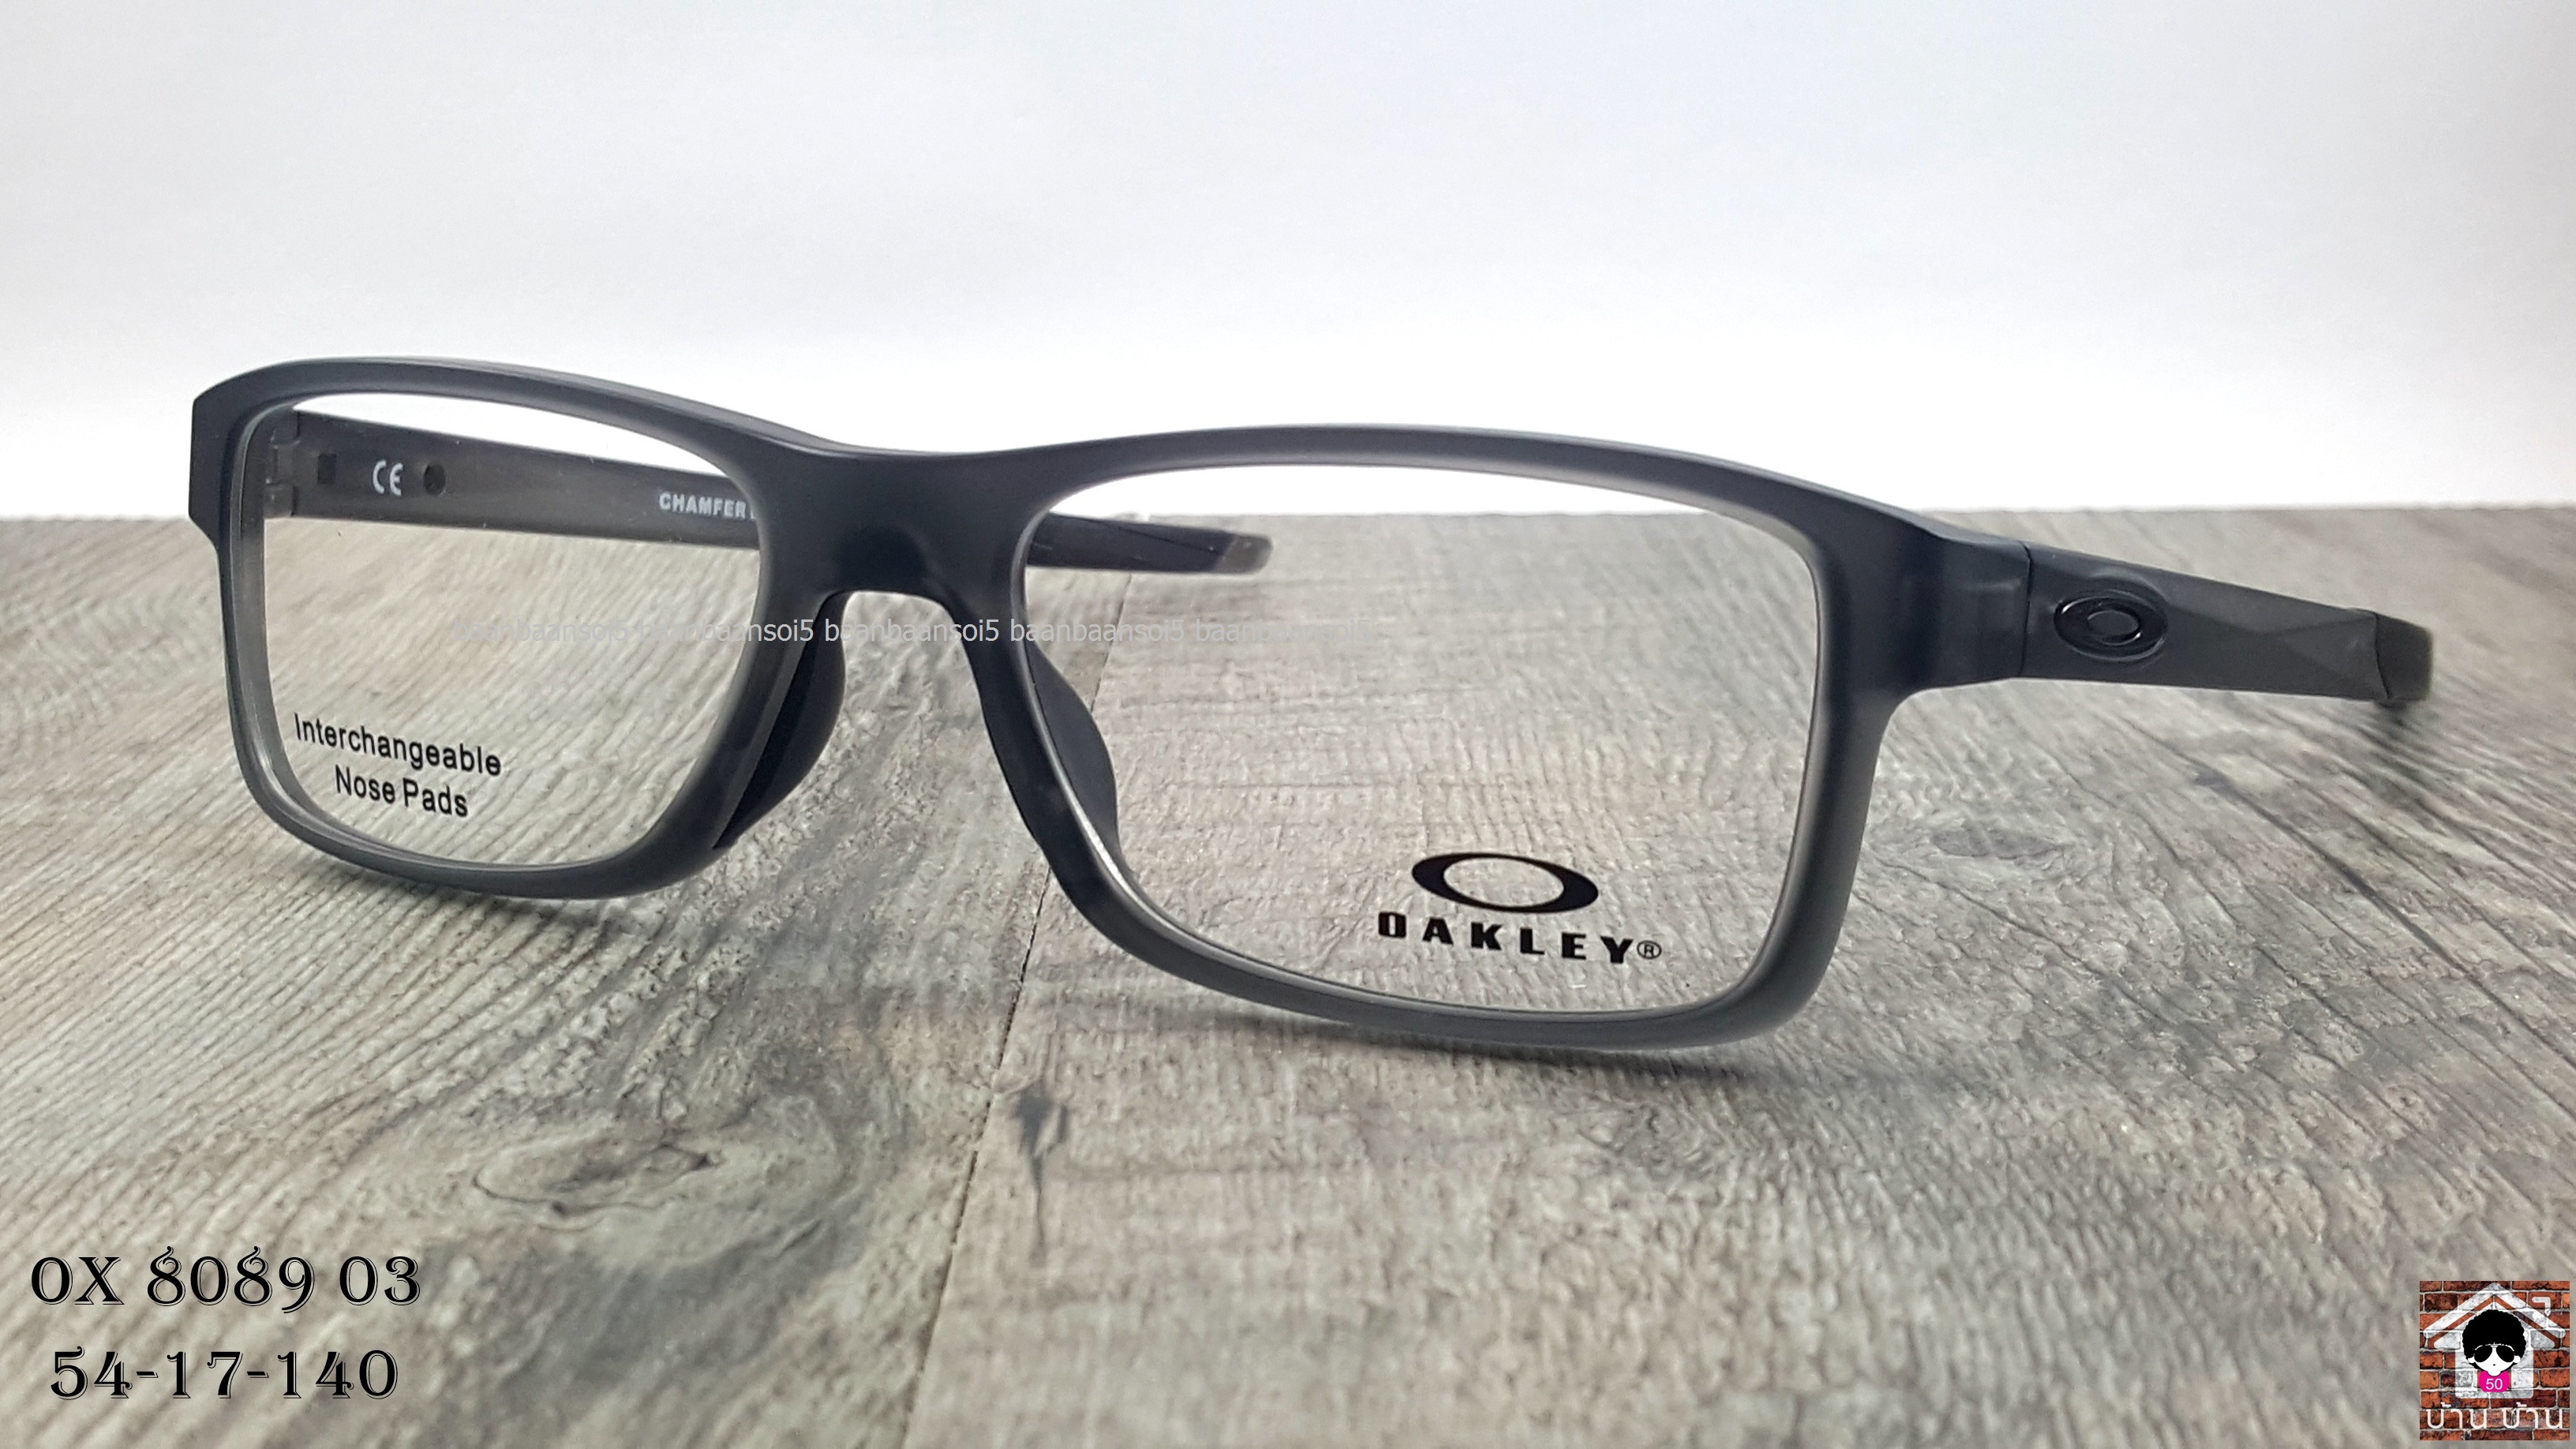 OAKLEY OX8089-03 CHAMFER MNP โปรโมชั่น กรอบแว่นตาพร้อมเลนส์ HOYA ราคา 4,700 บาท